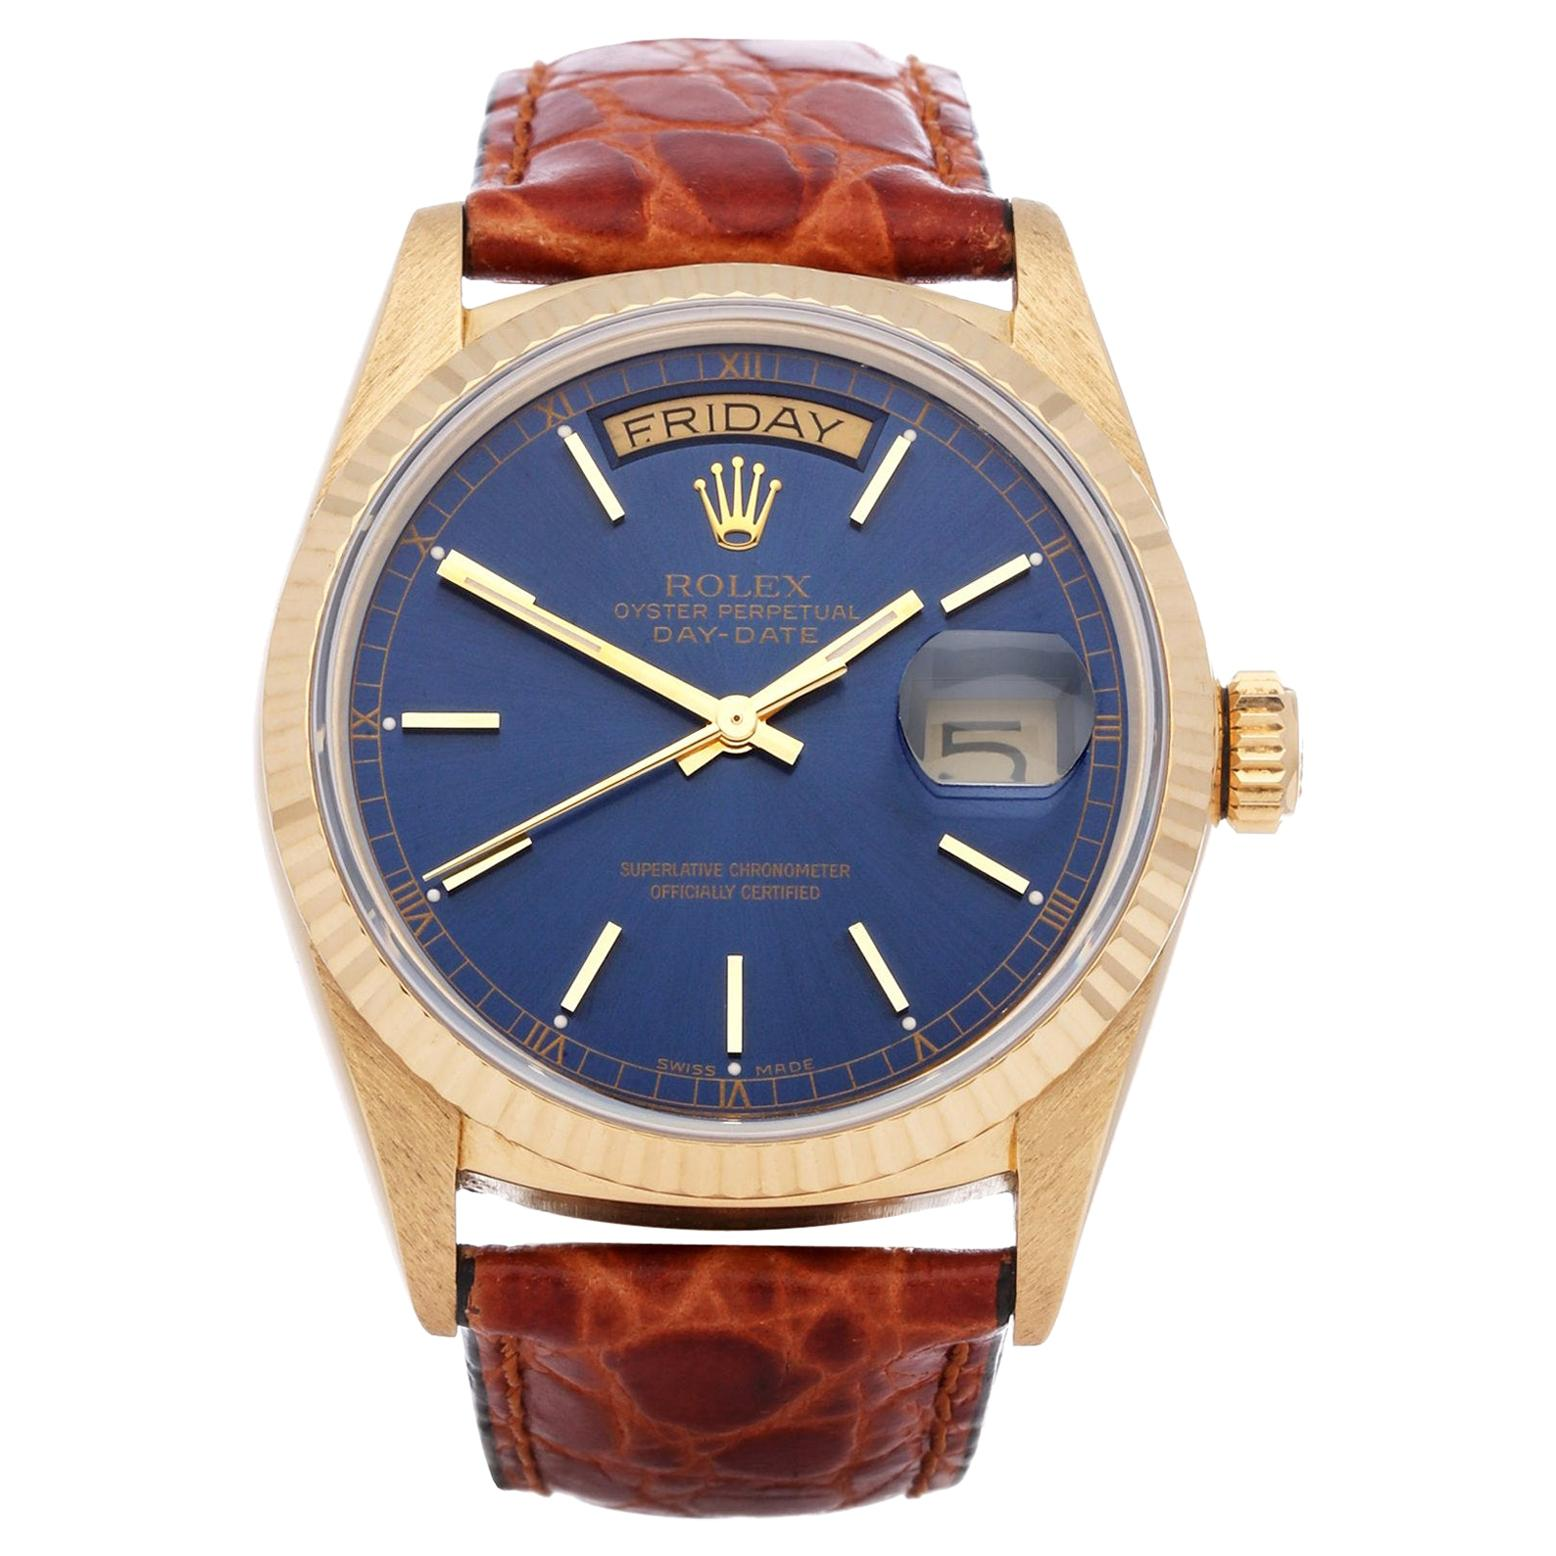 Rolex Day-Date 36 18038 Men's Yellow Gold Watch